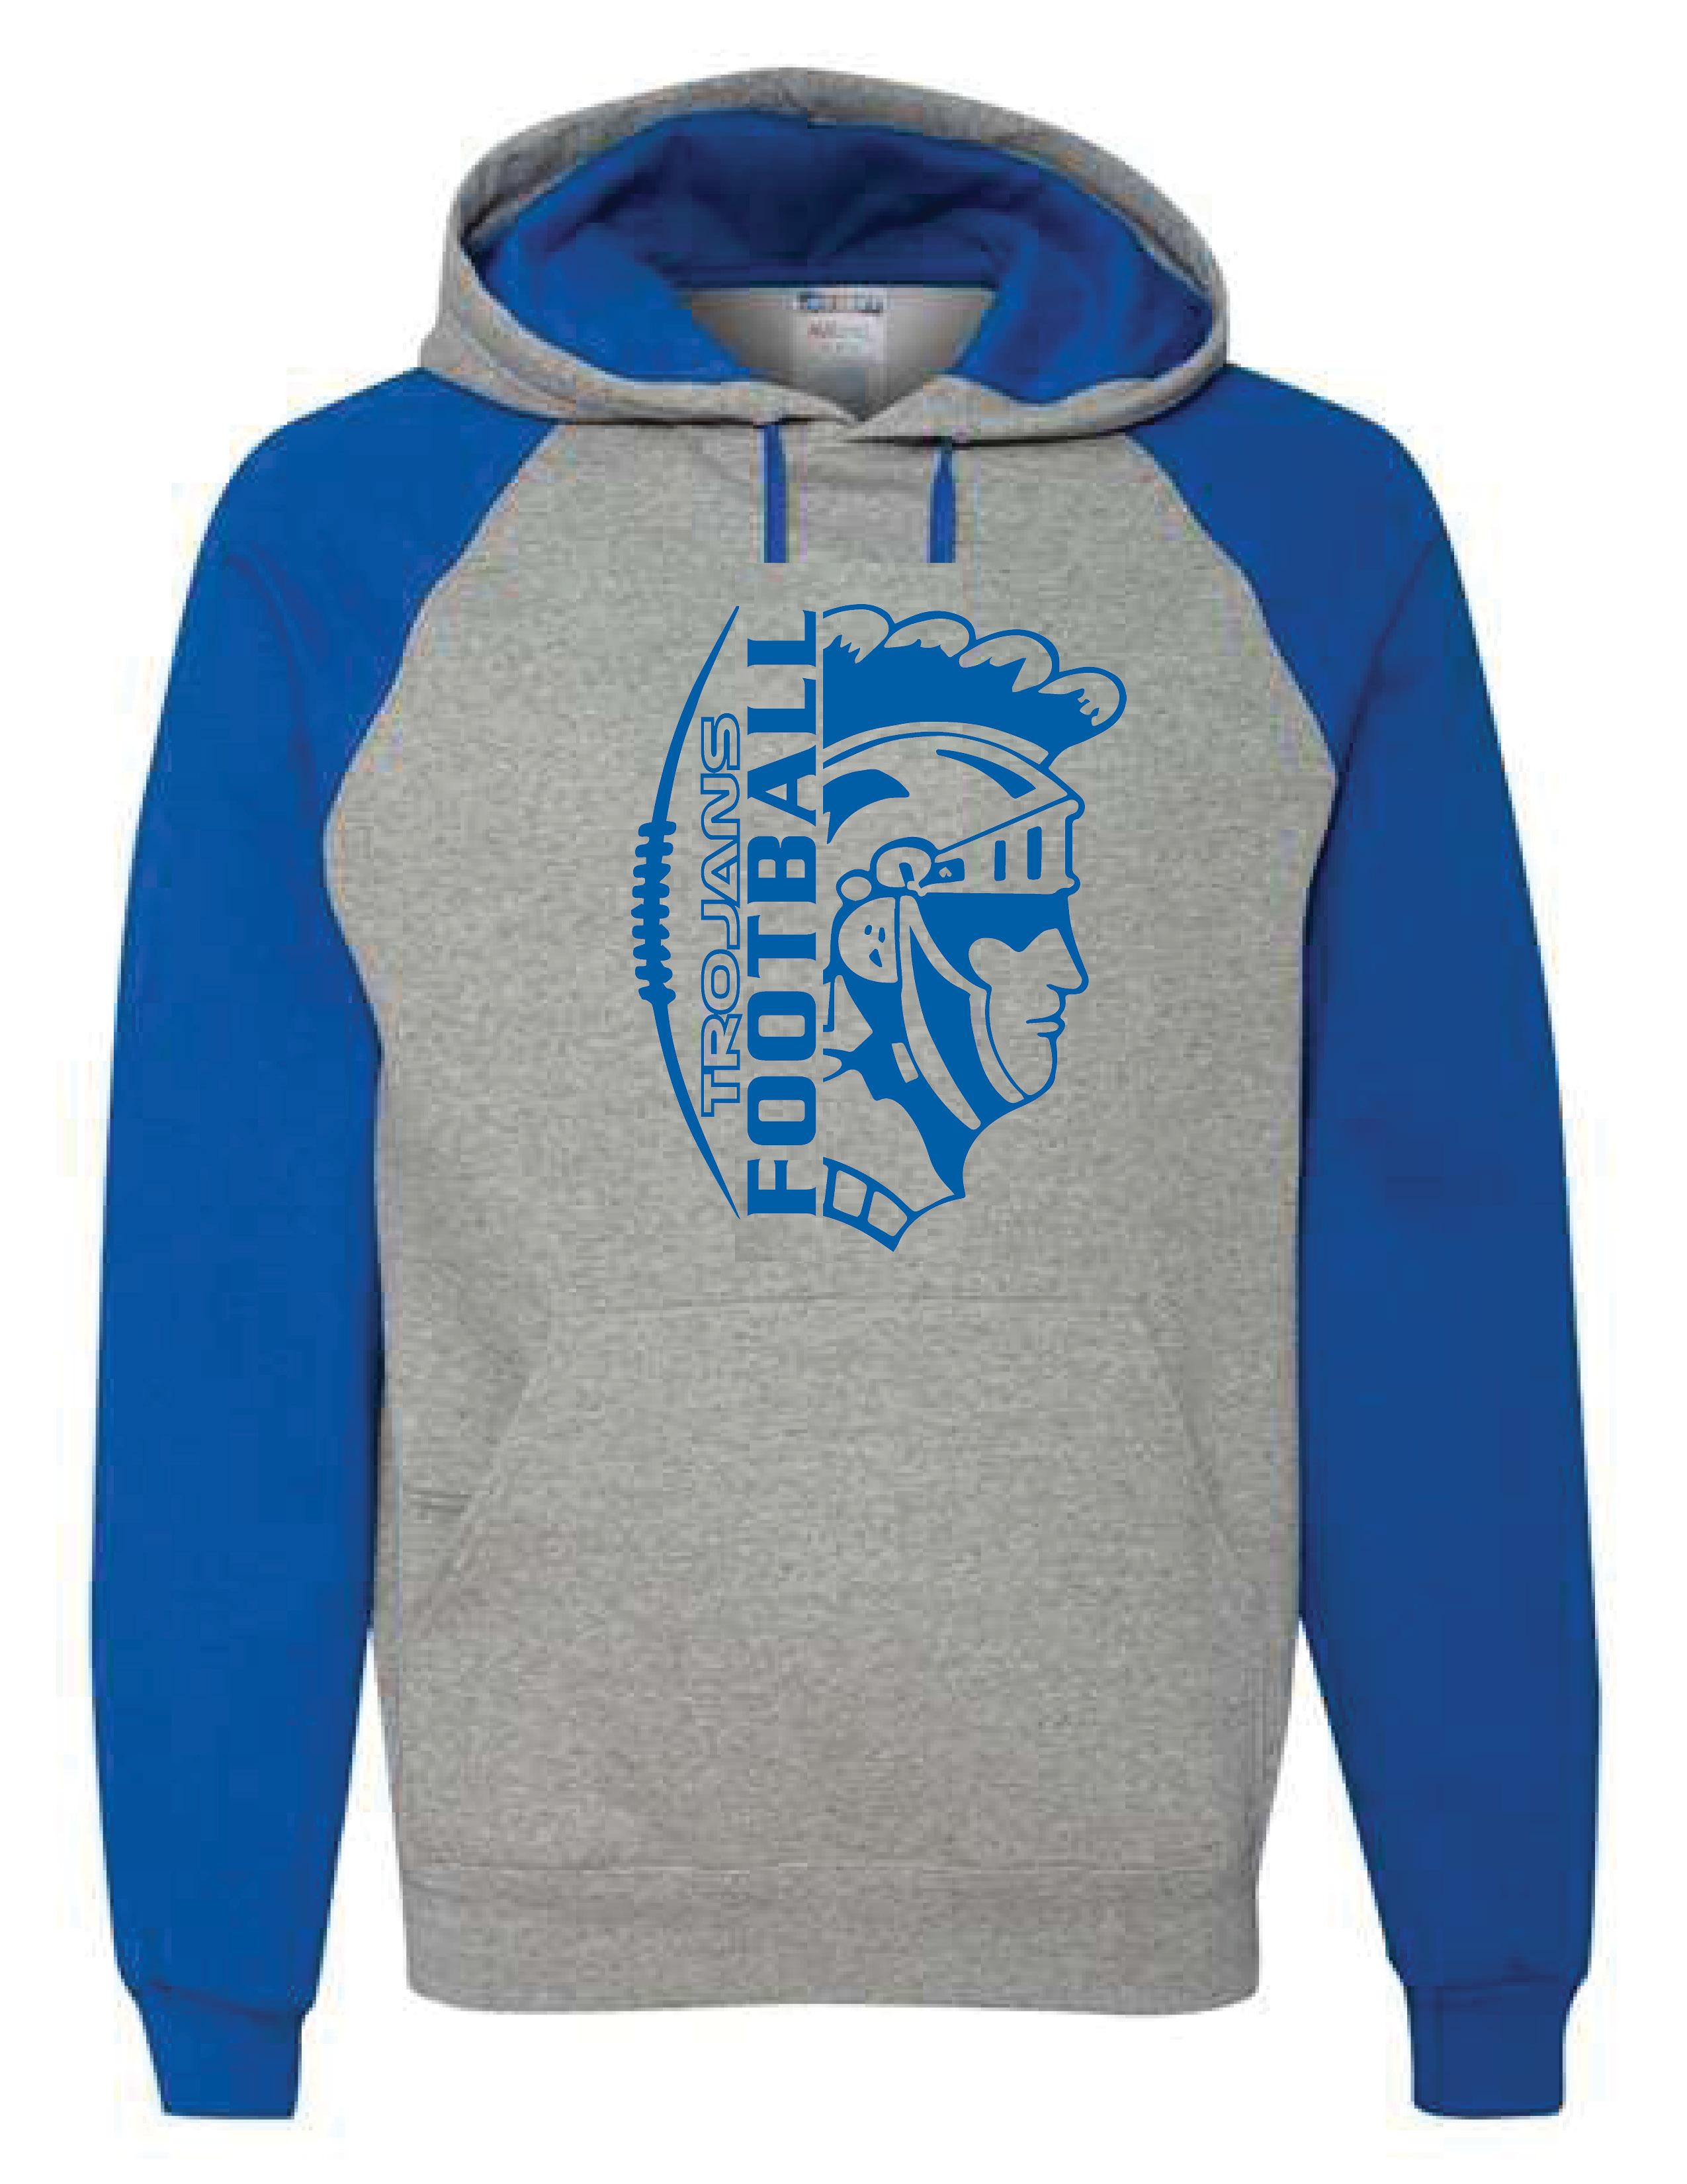 Colorblocked Hooded Sweatshirt  (TROJAN)